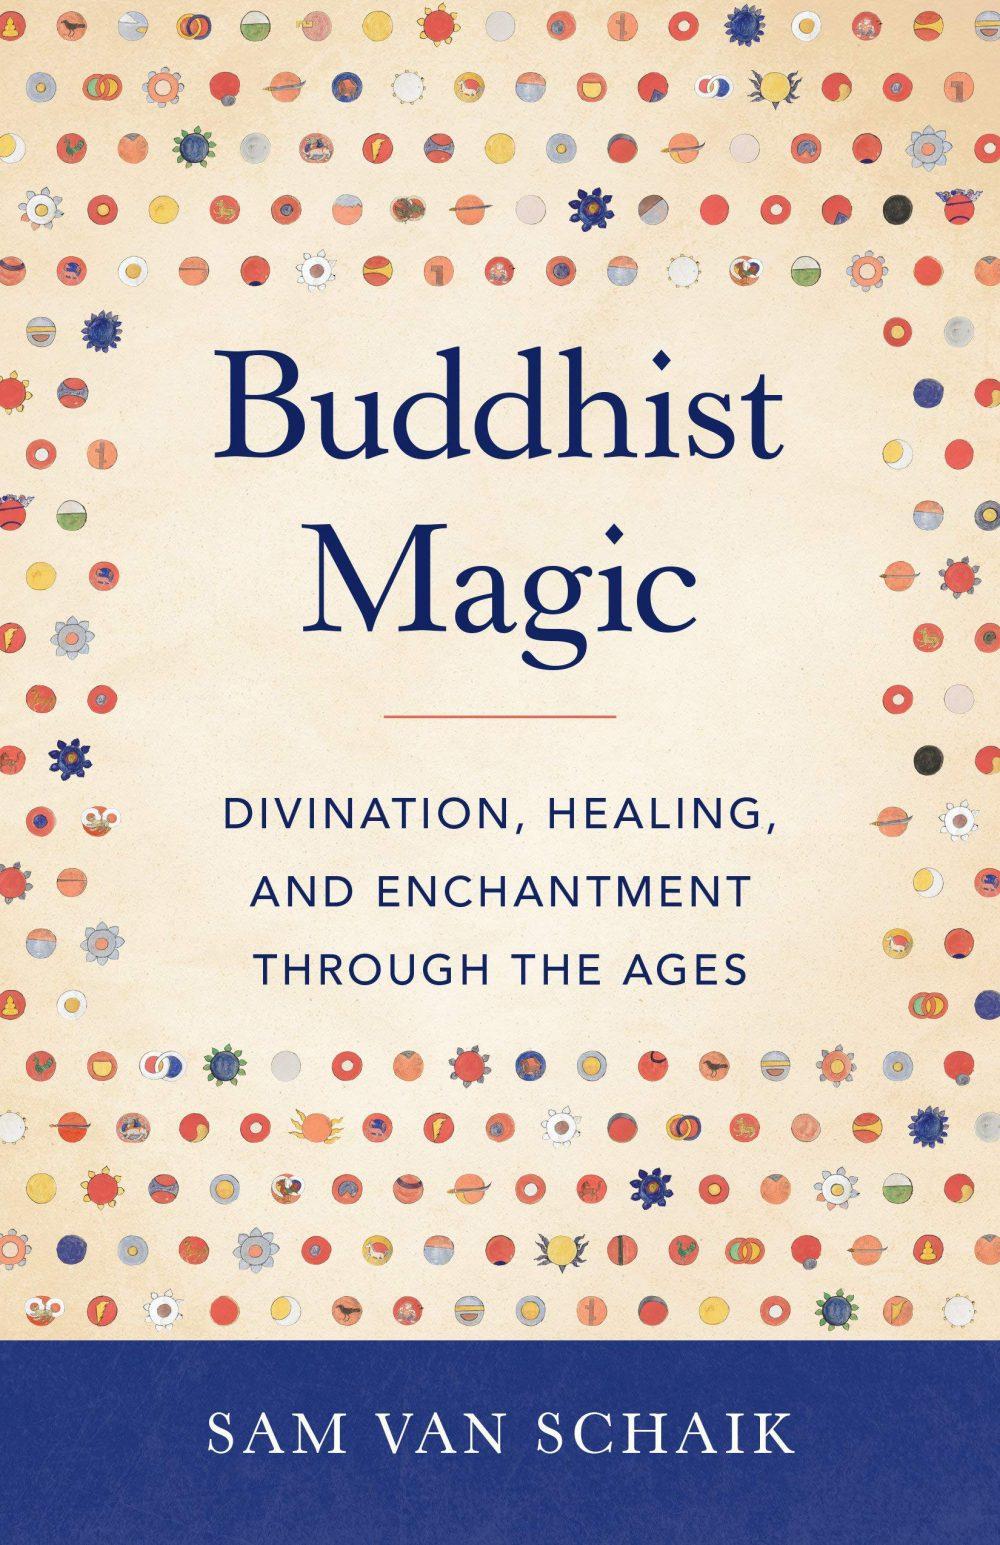 Buddhist Magic: Divination, Healing, and Enchantment through the Ages, Sam van Schaik (Shambhala, July 2020)